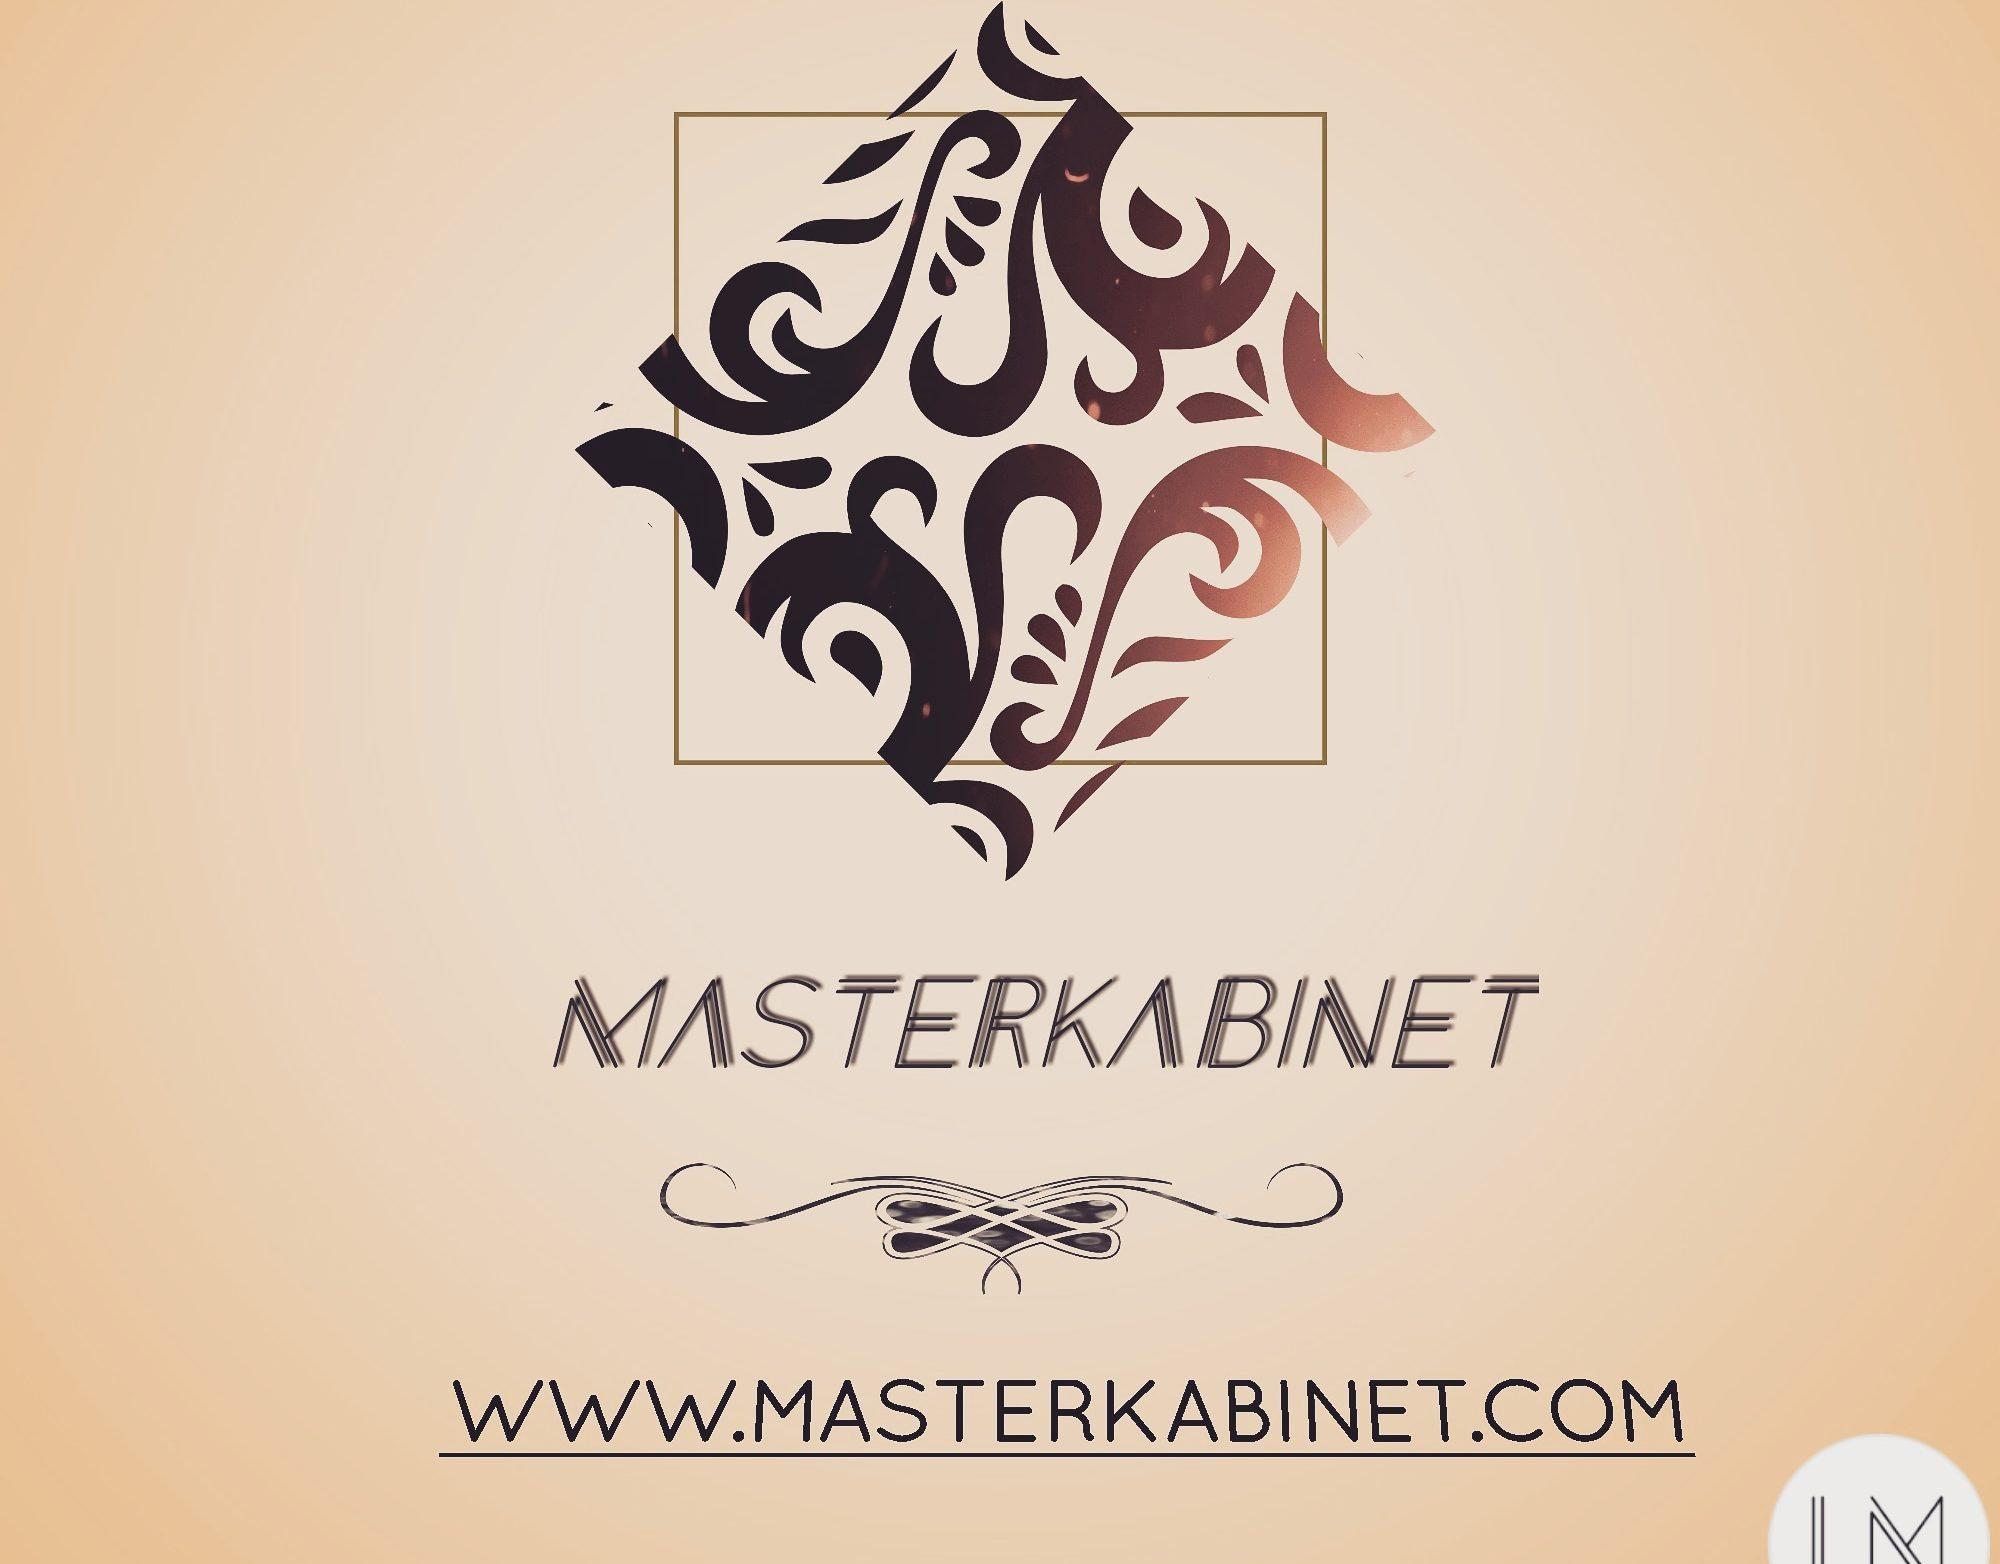 مستر کابینت masterkabinet